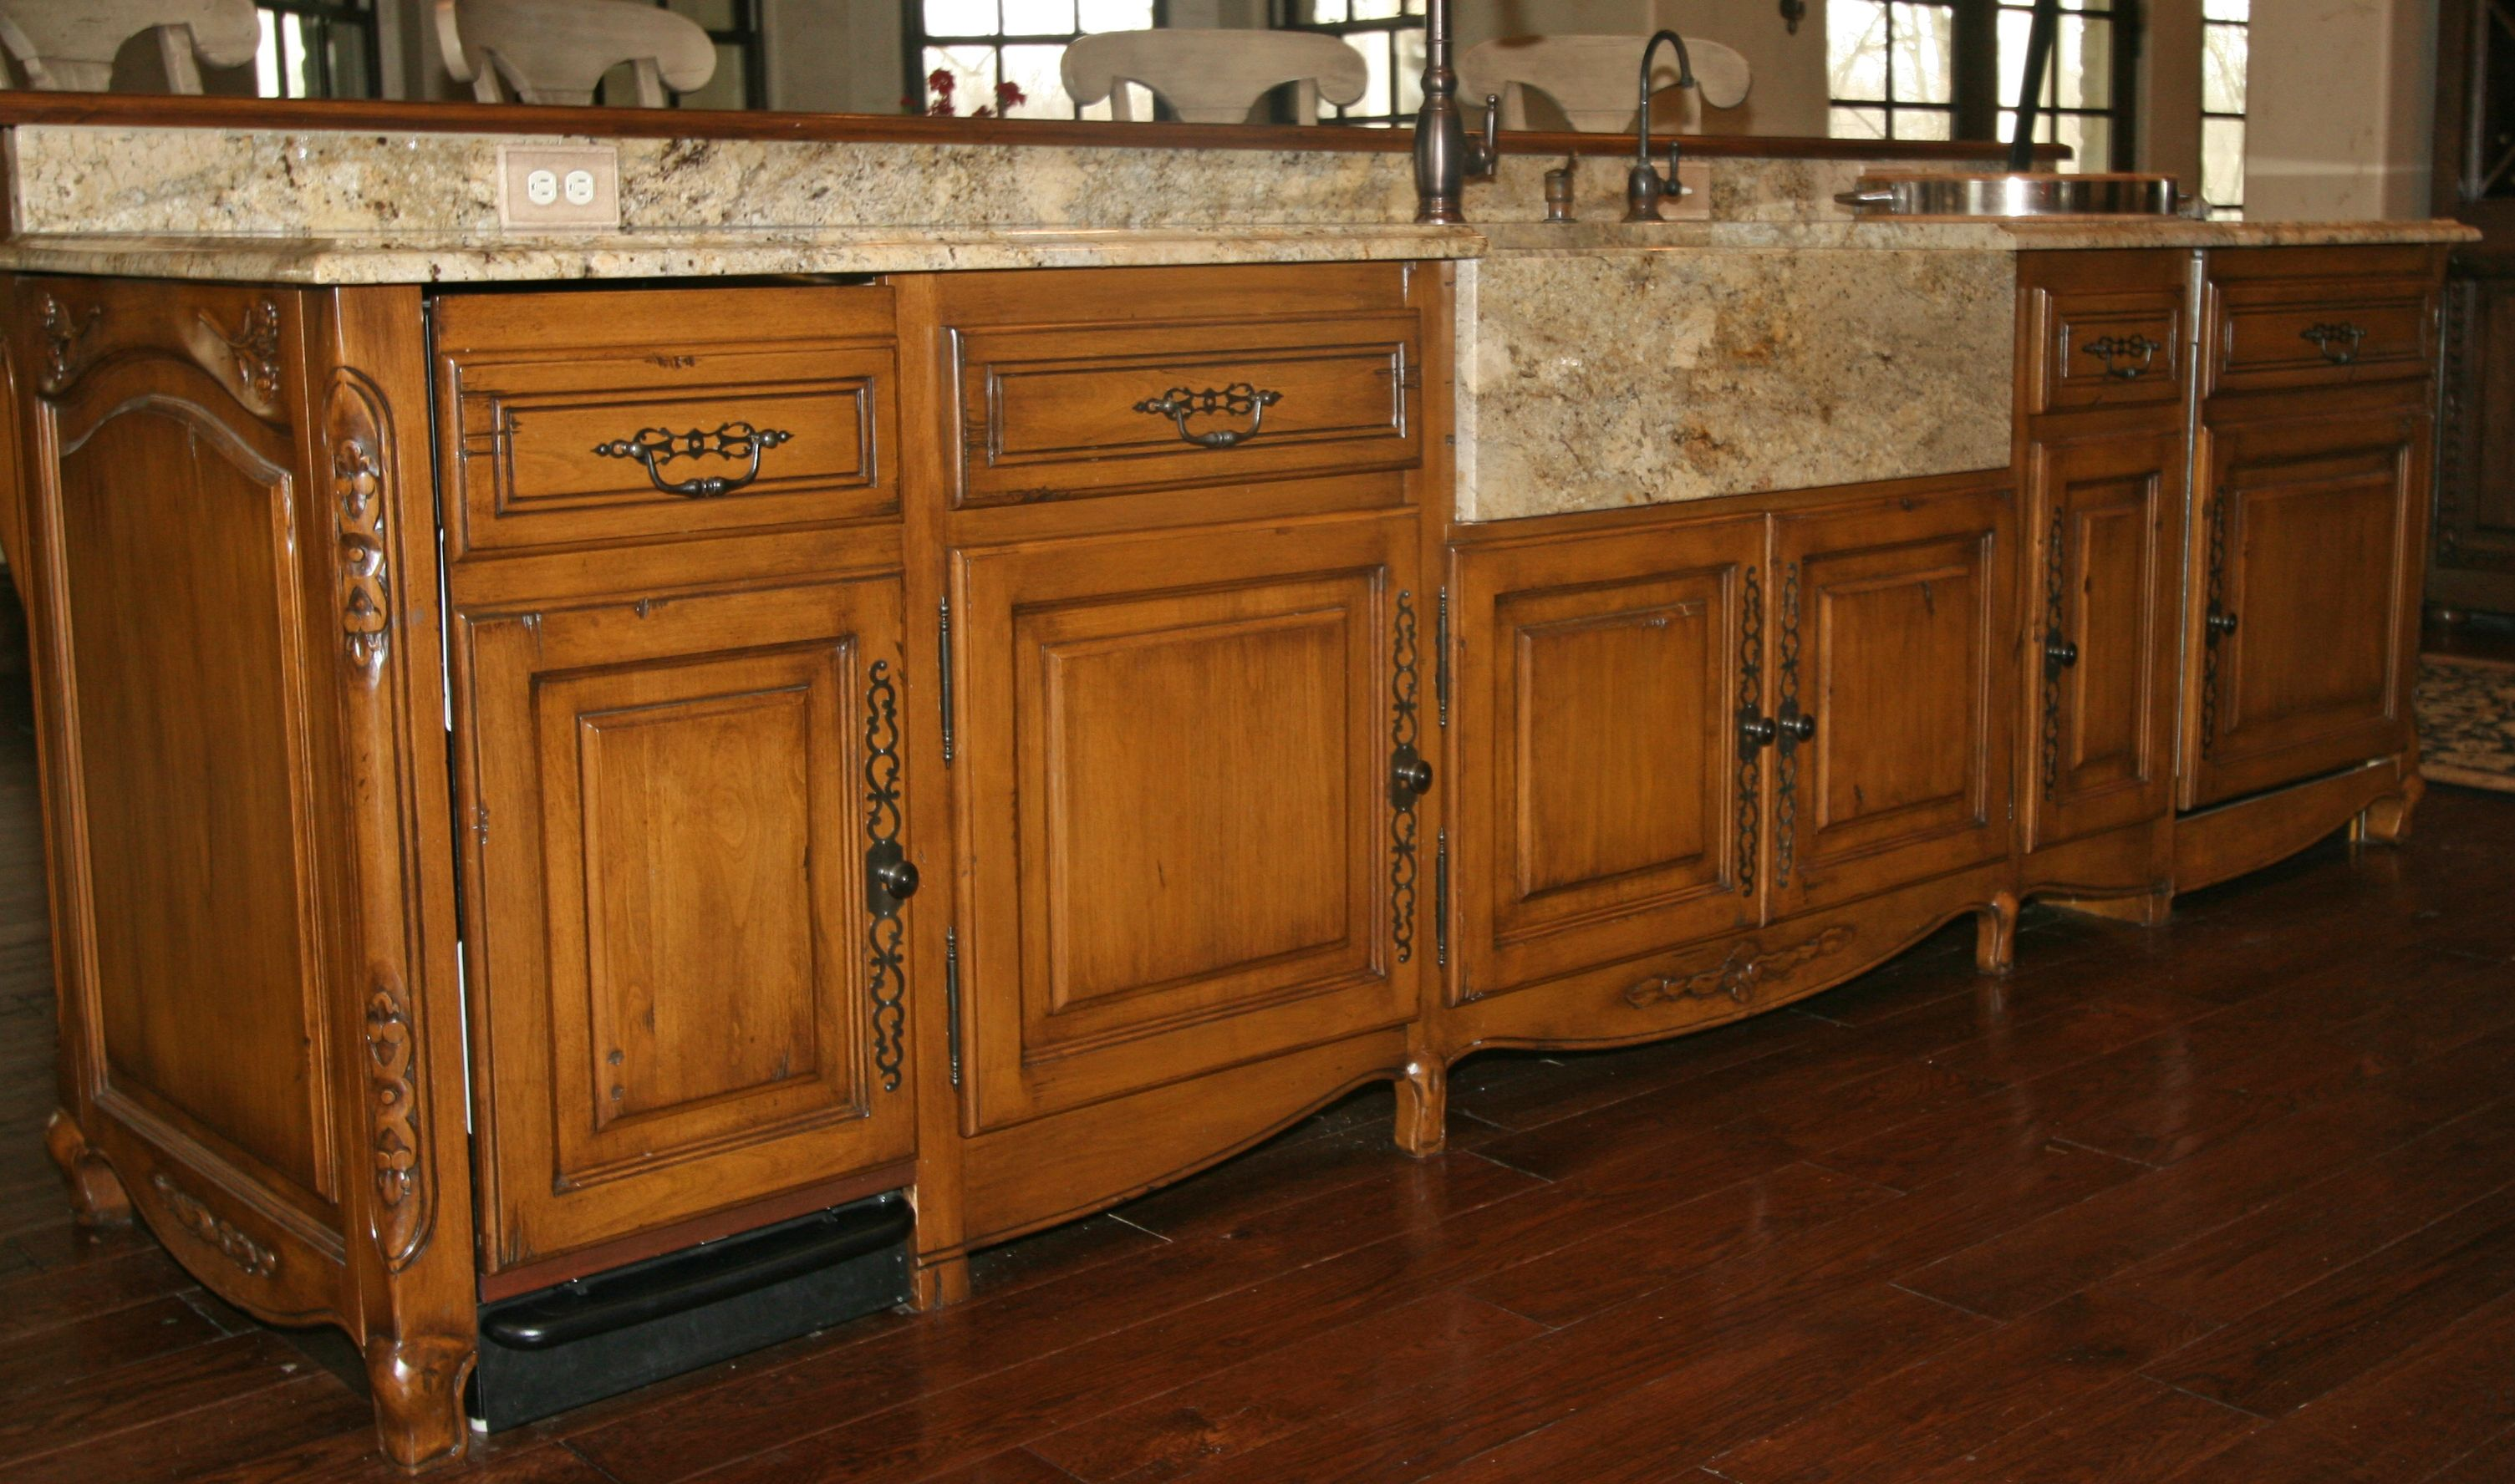 Granite Apron Front Sink : Apron front granite sink Kitchen ideas Pinterest